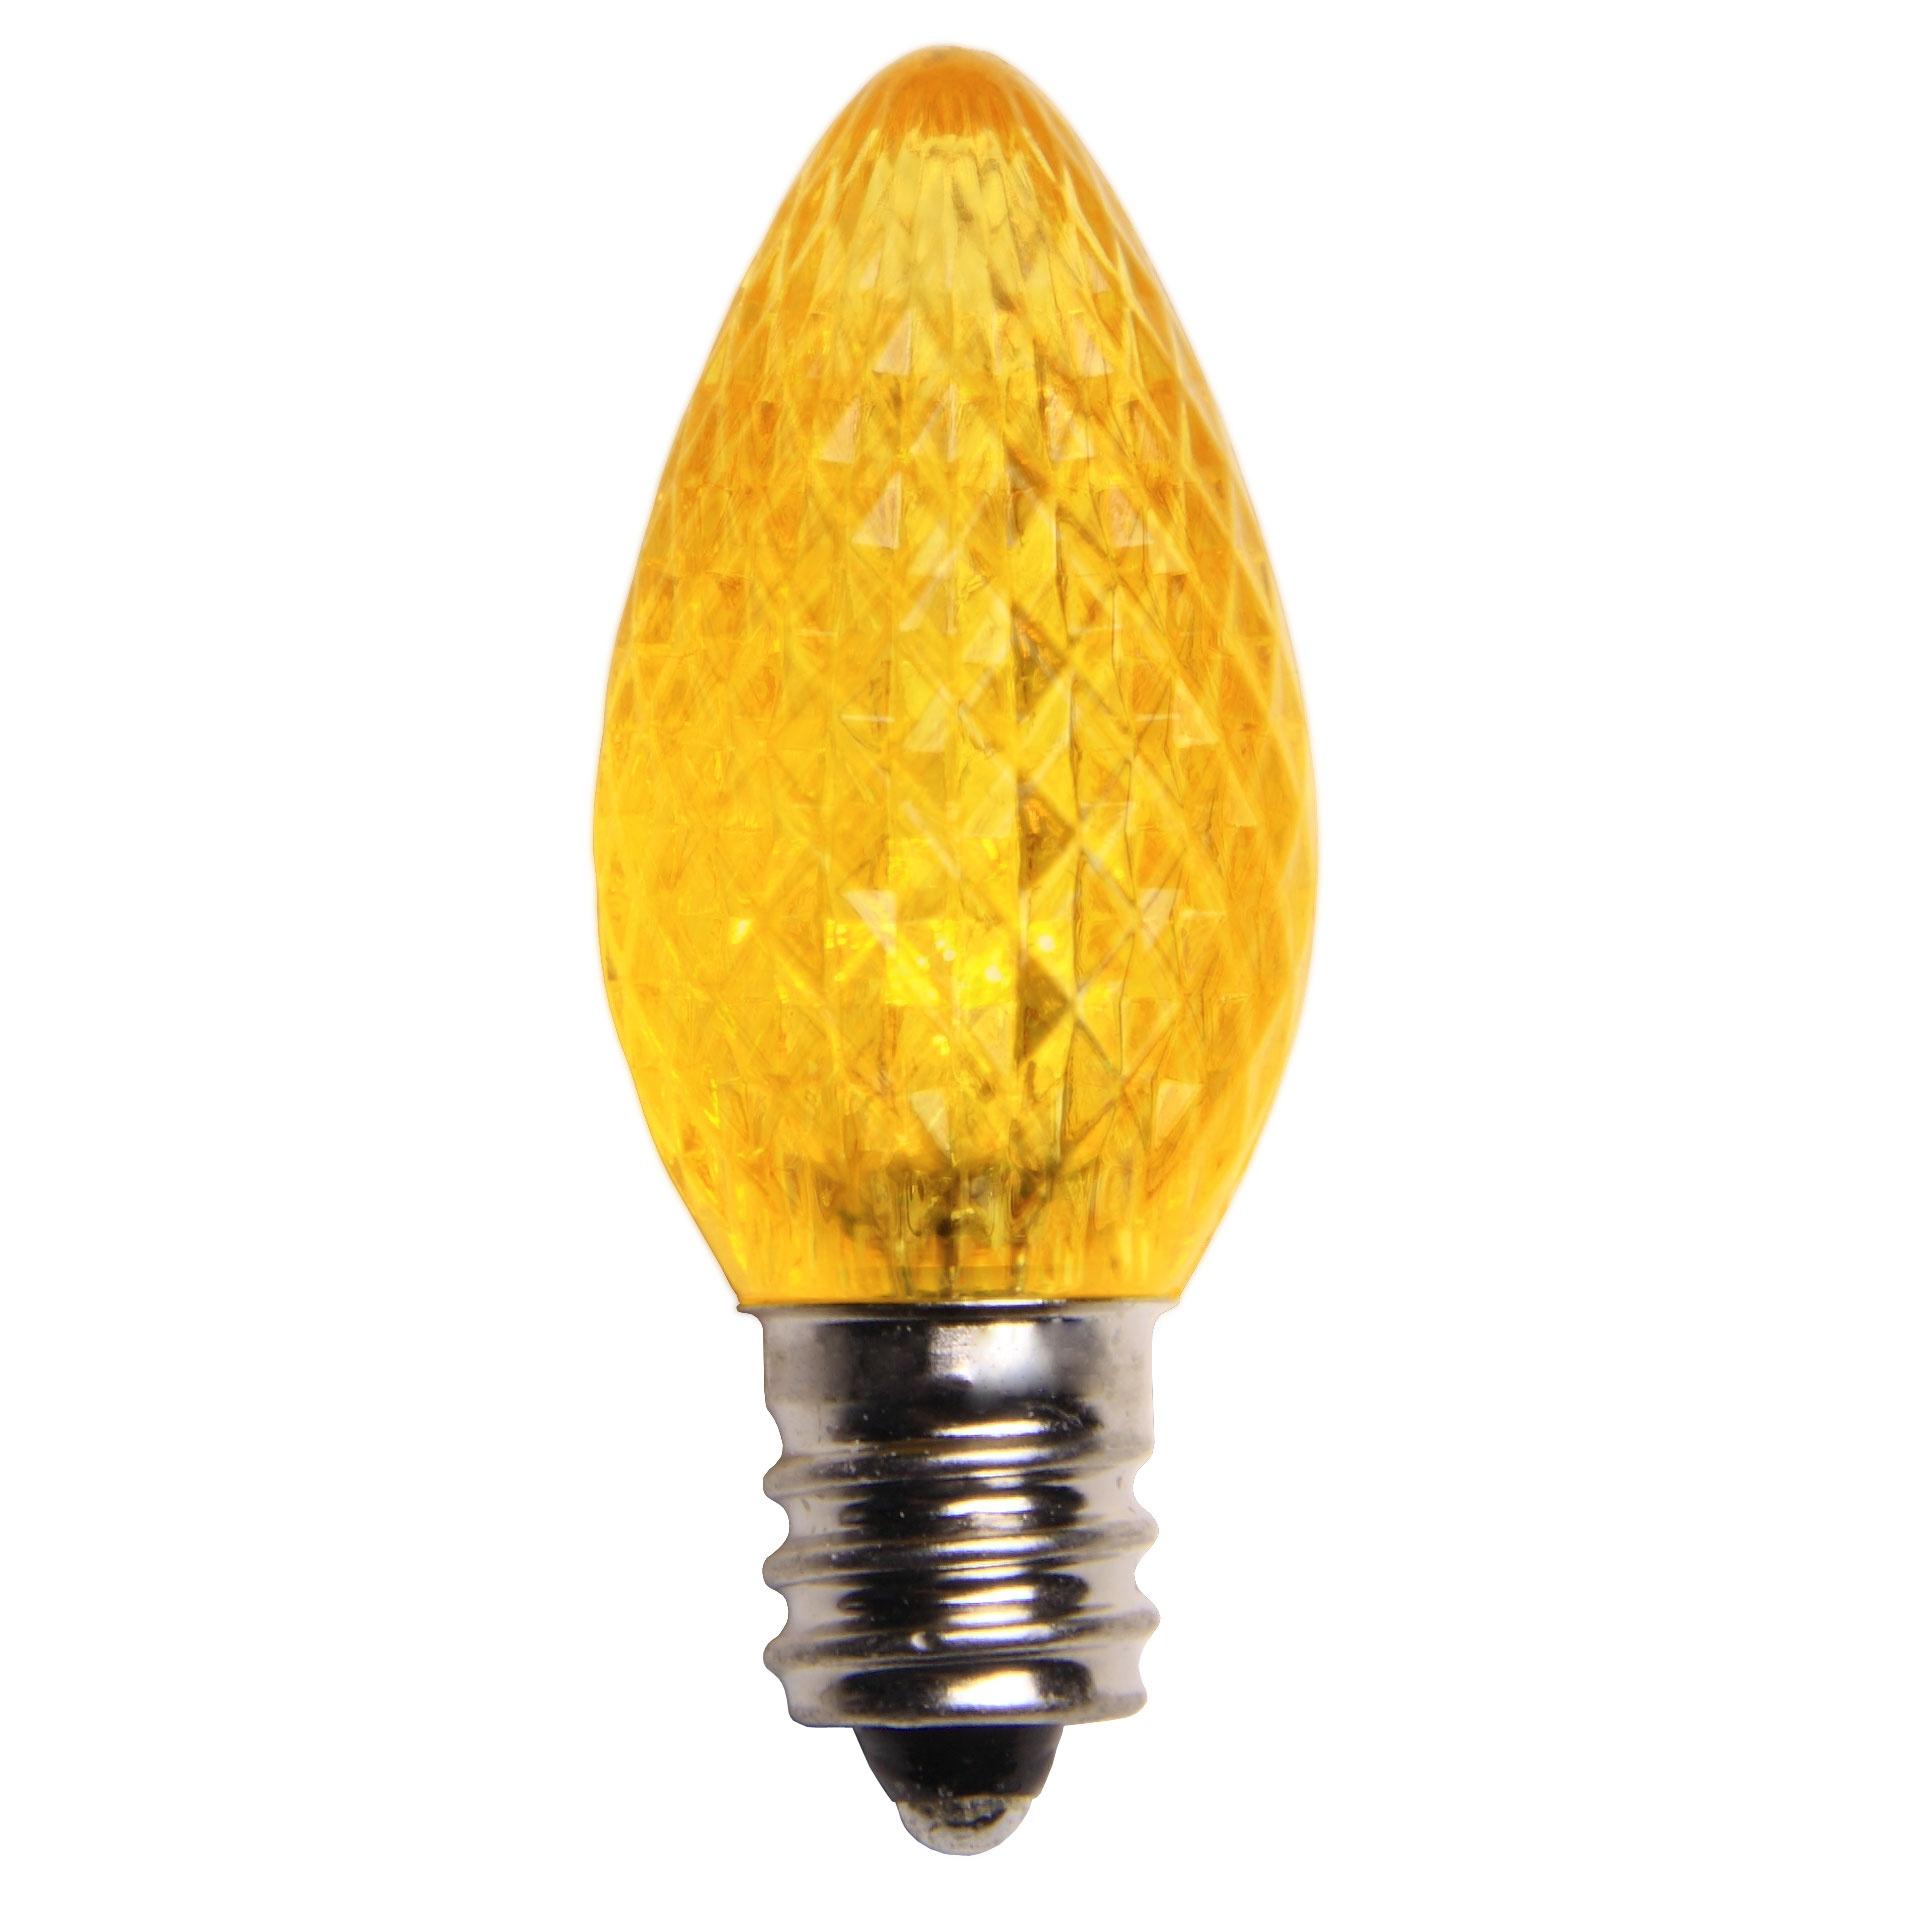 C7 Gold Led Christmas Light Bulbs